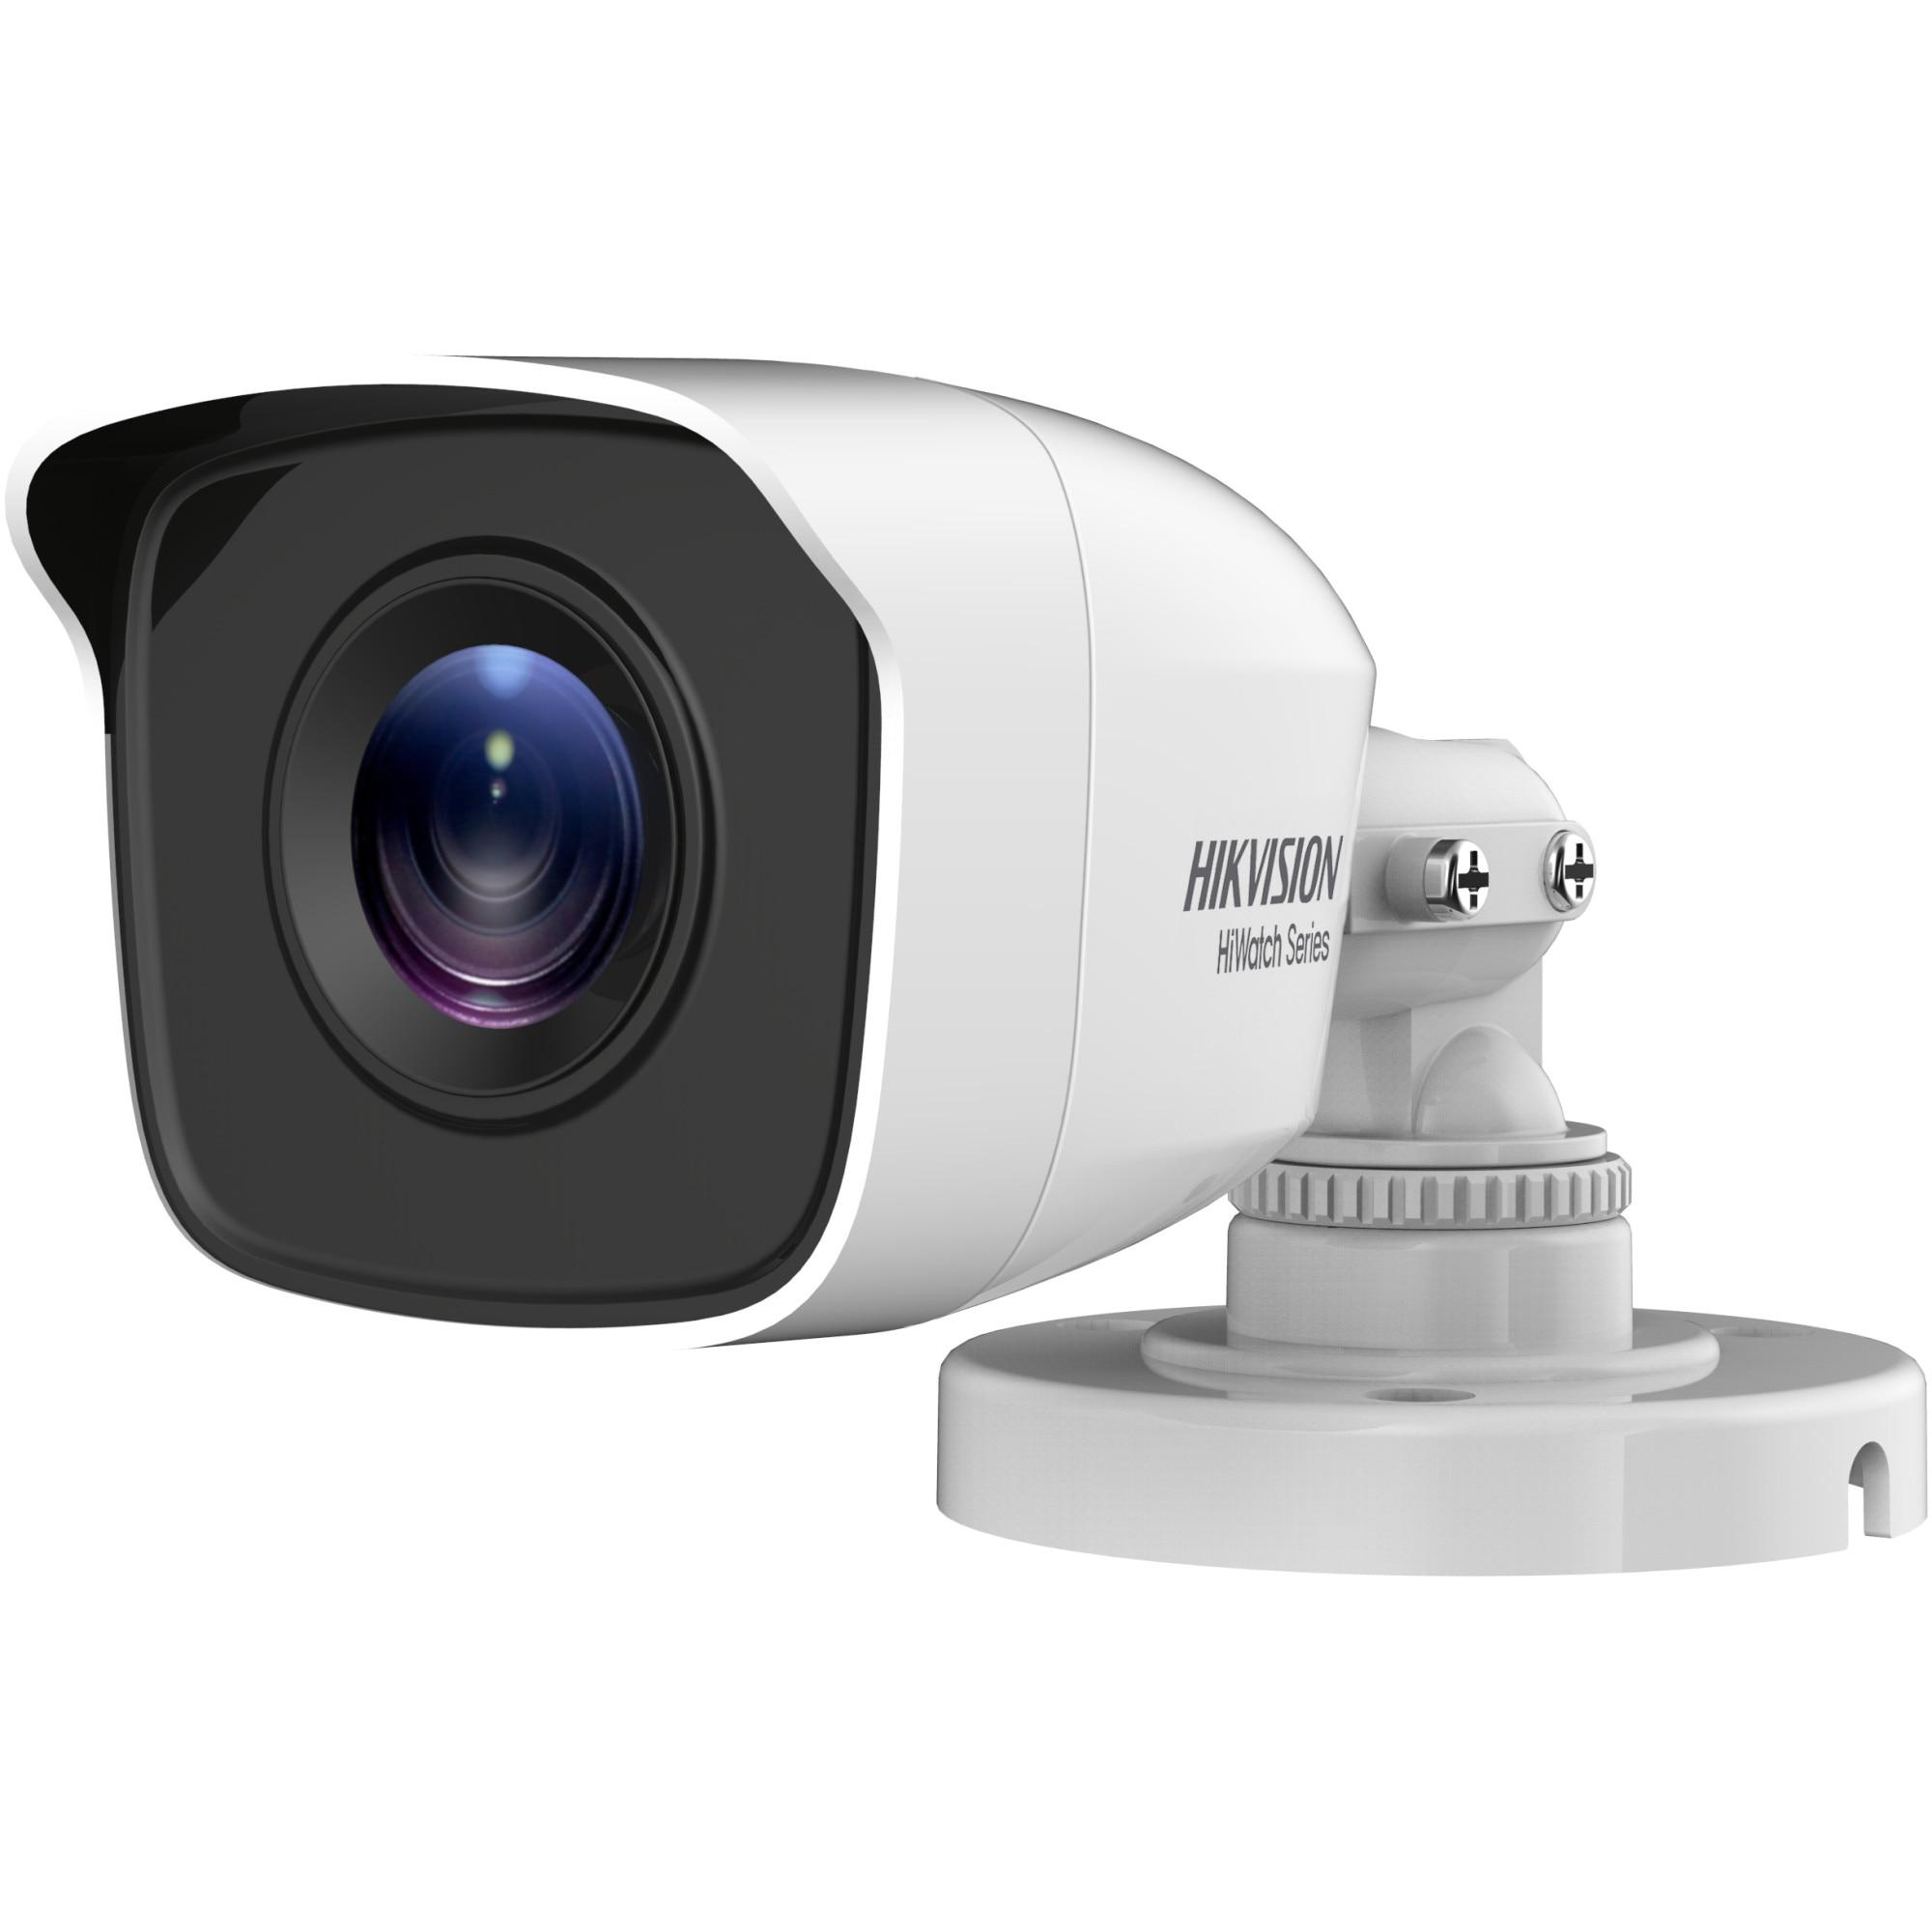 Fotografie Camera de supraveghere Hikvision HiWatch Turbo HD Bullet, 4MP, 2.8mm Lens, EXIR Bullet, 20m IR, IP66, carcasa metal, Alb